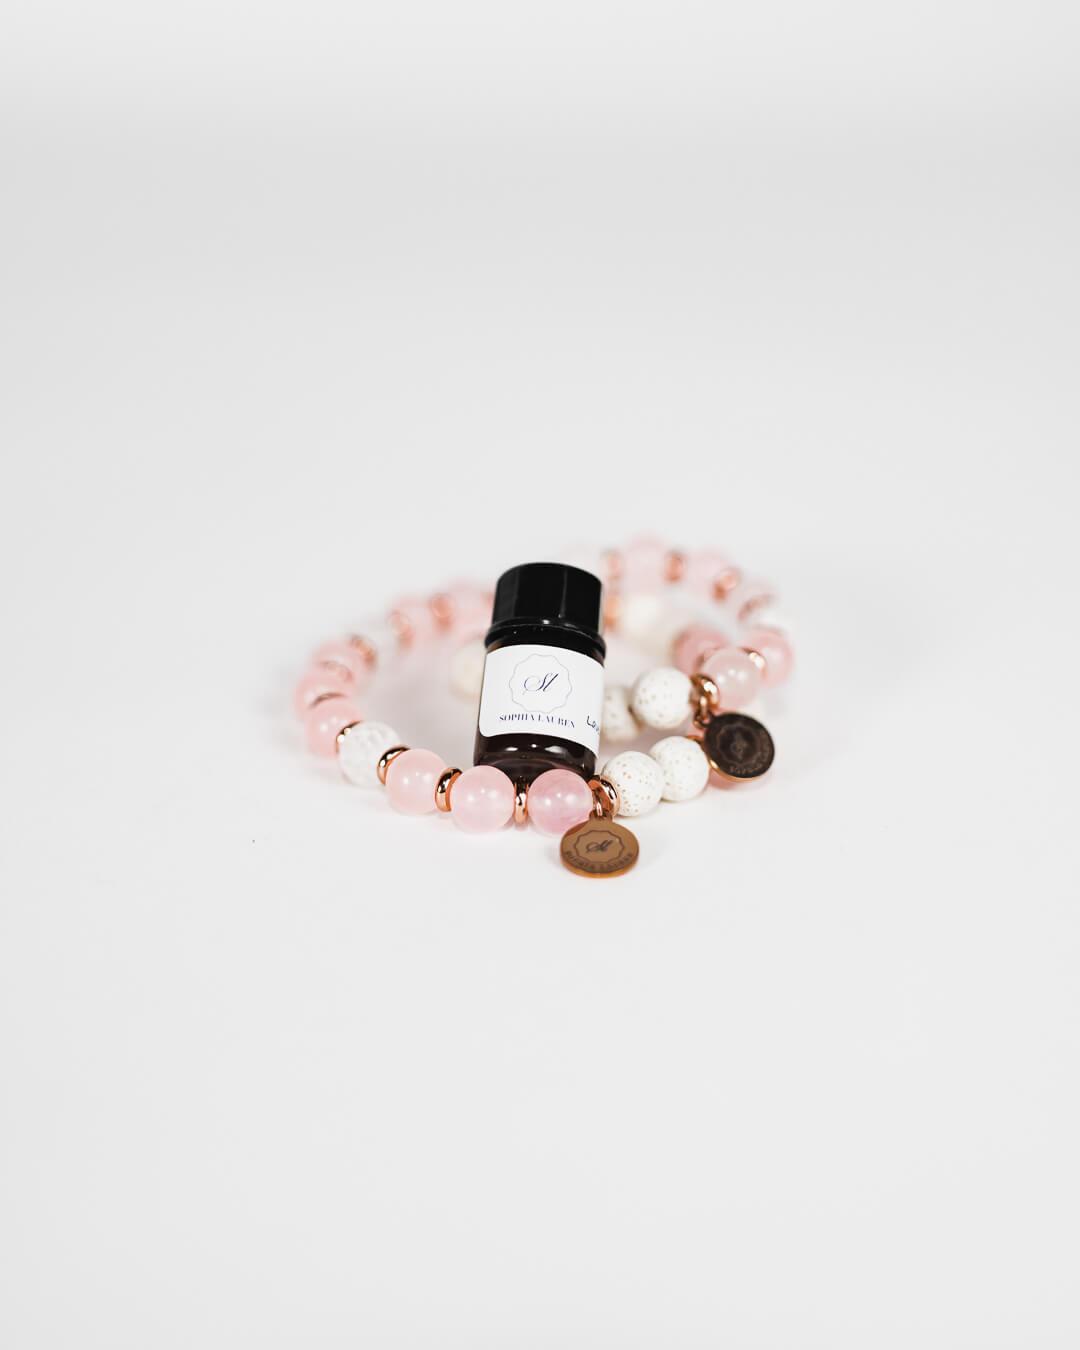 essential oil bracelet and oil